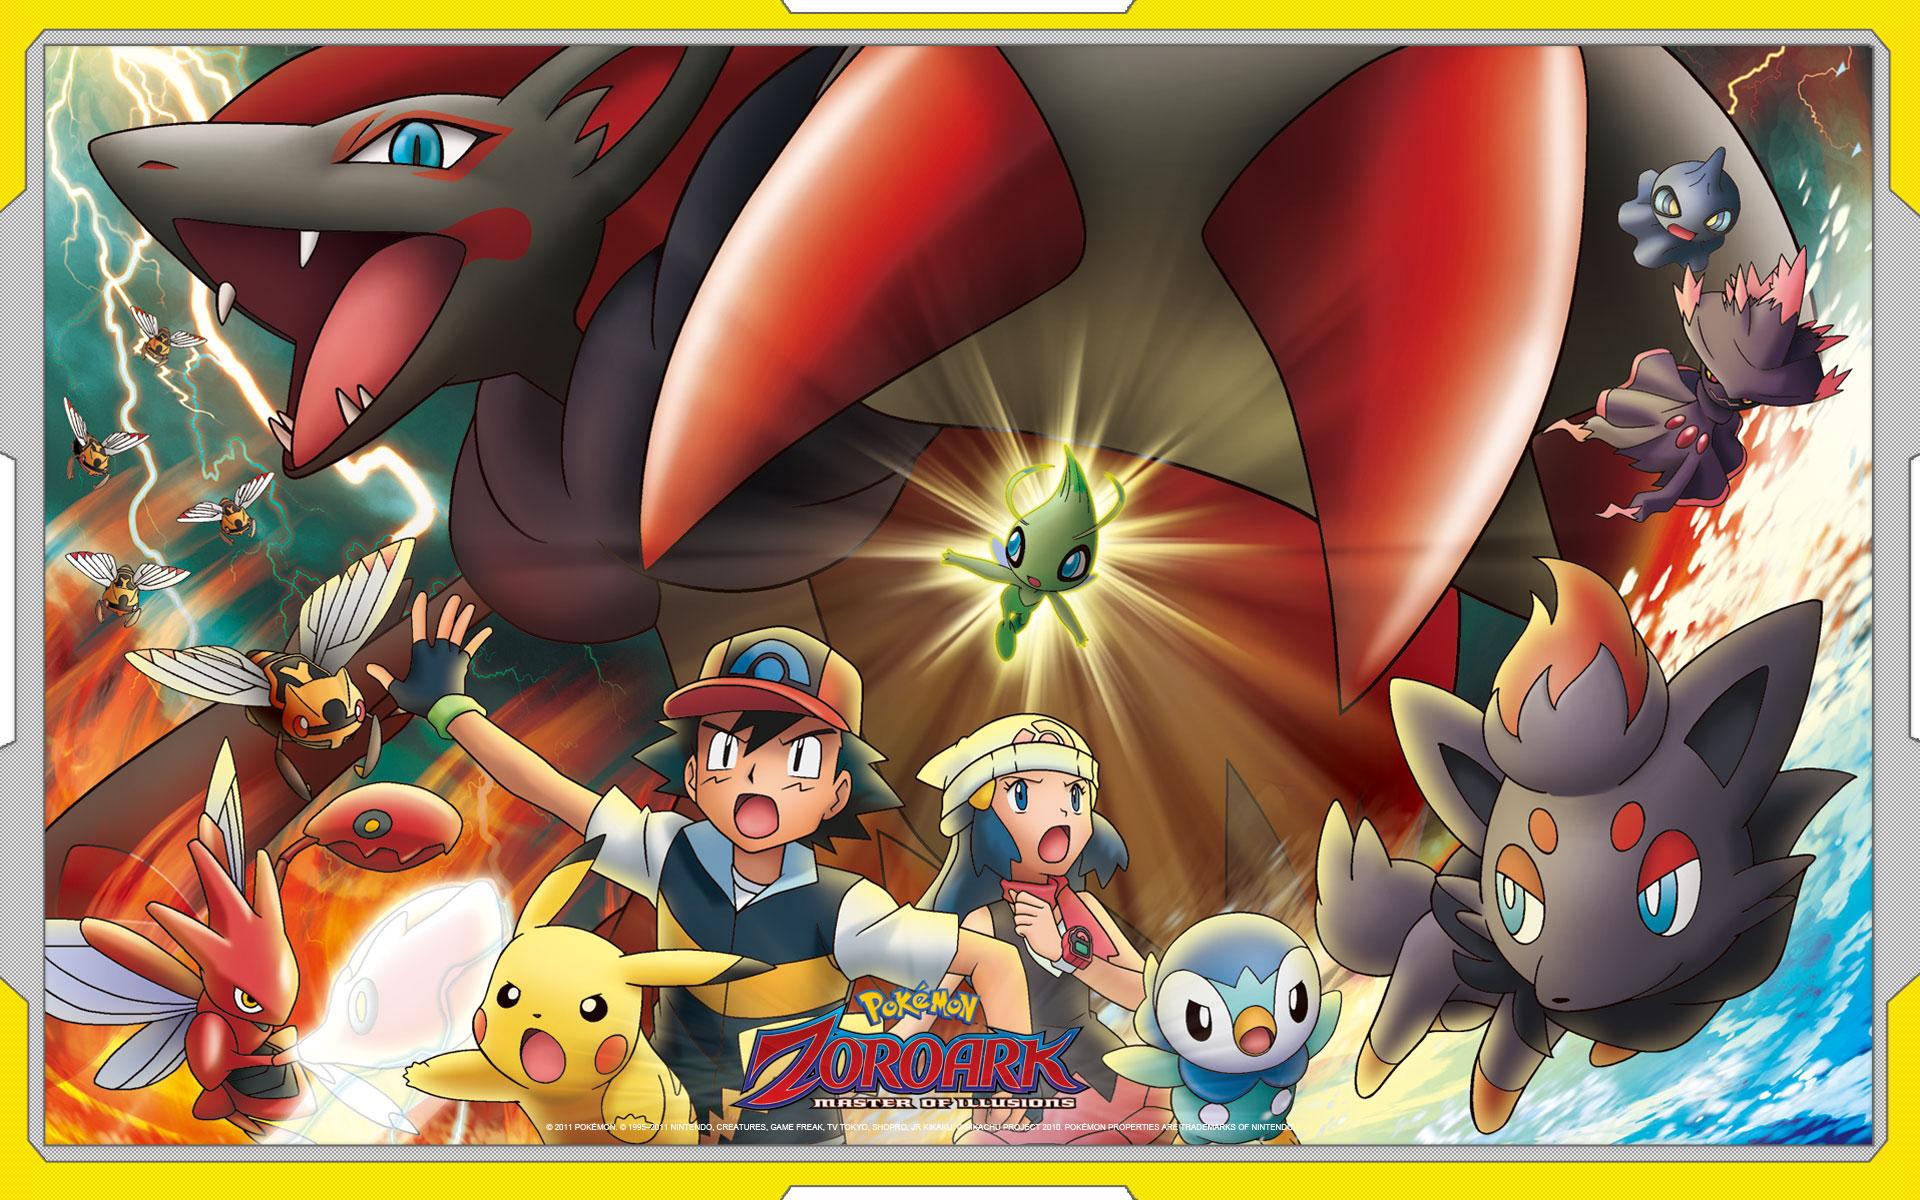 Pokémon the movie: zoroark: master of illusions zerochan anime.